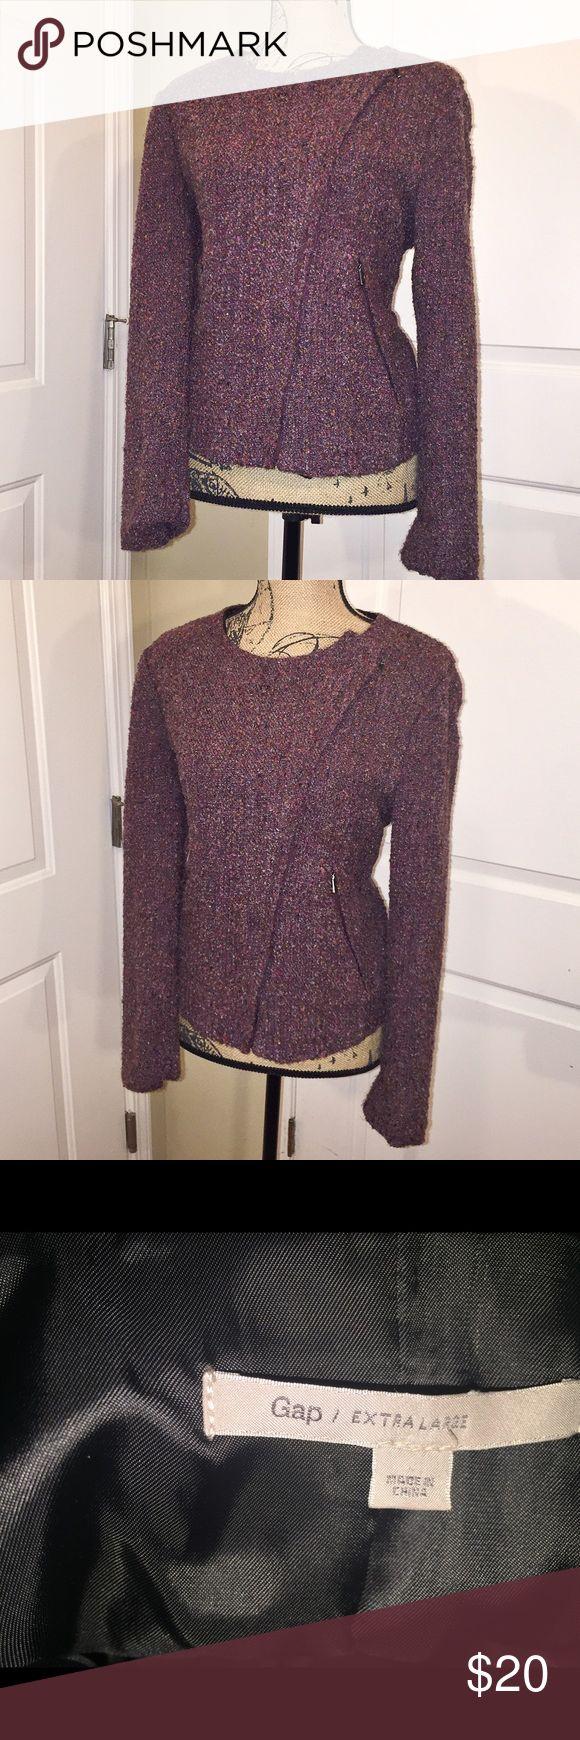 Gap coat Asymmetrical zip up coat. Fitted moto style coat. GAP Jackets & Coats